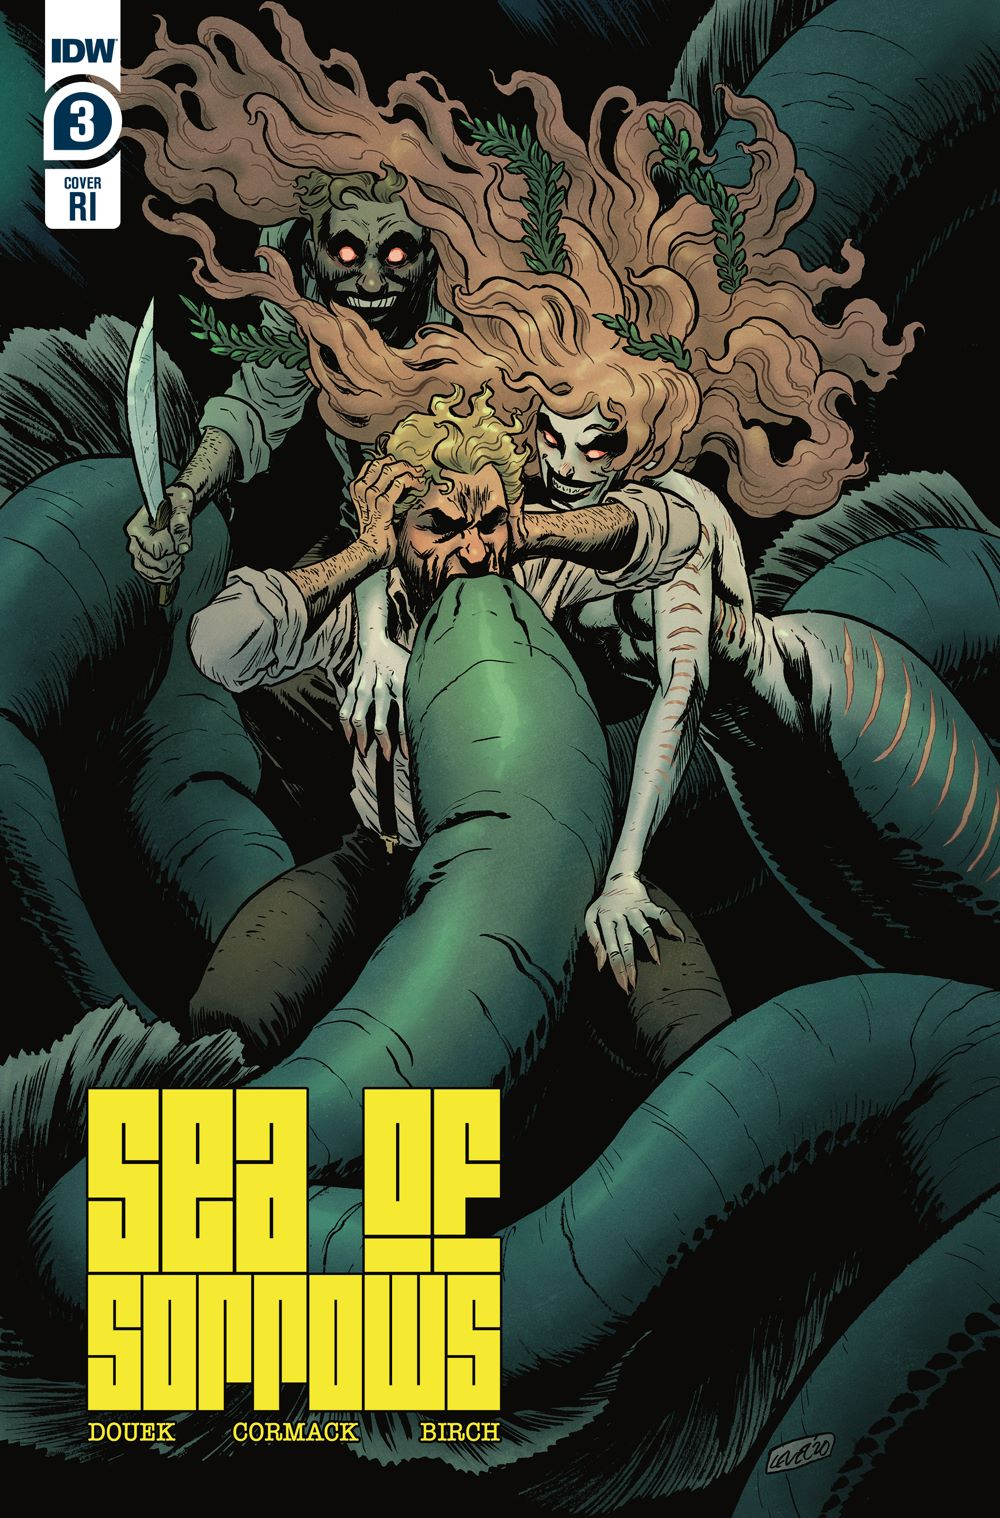 SeaofSorrow_04-RIcvr ComicList Previews: SEA OF SORROWS #3 (OF 5)